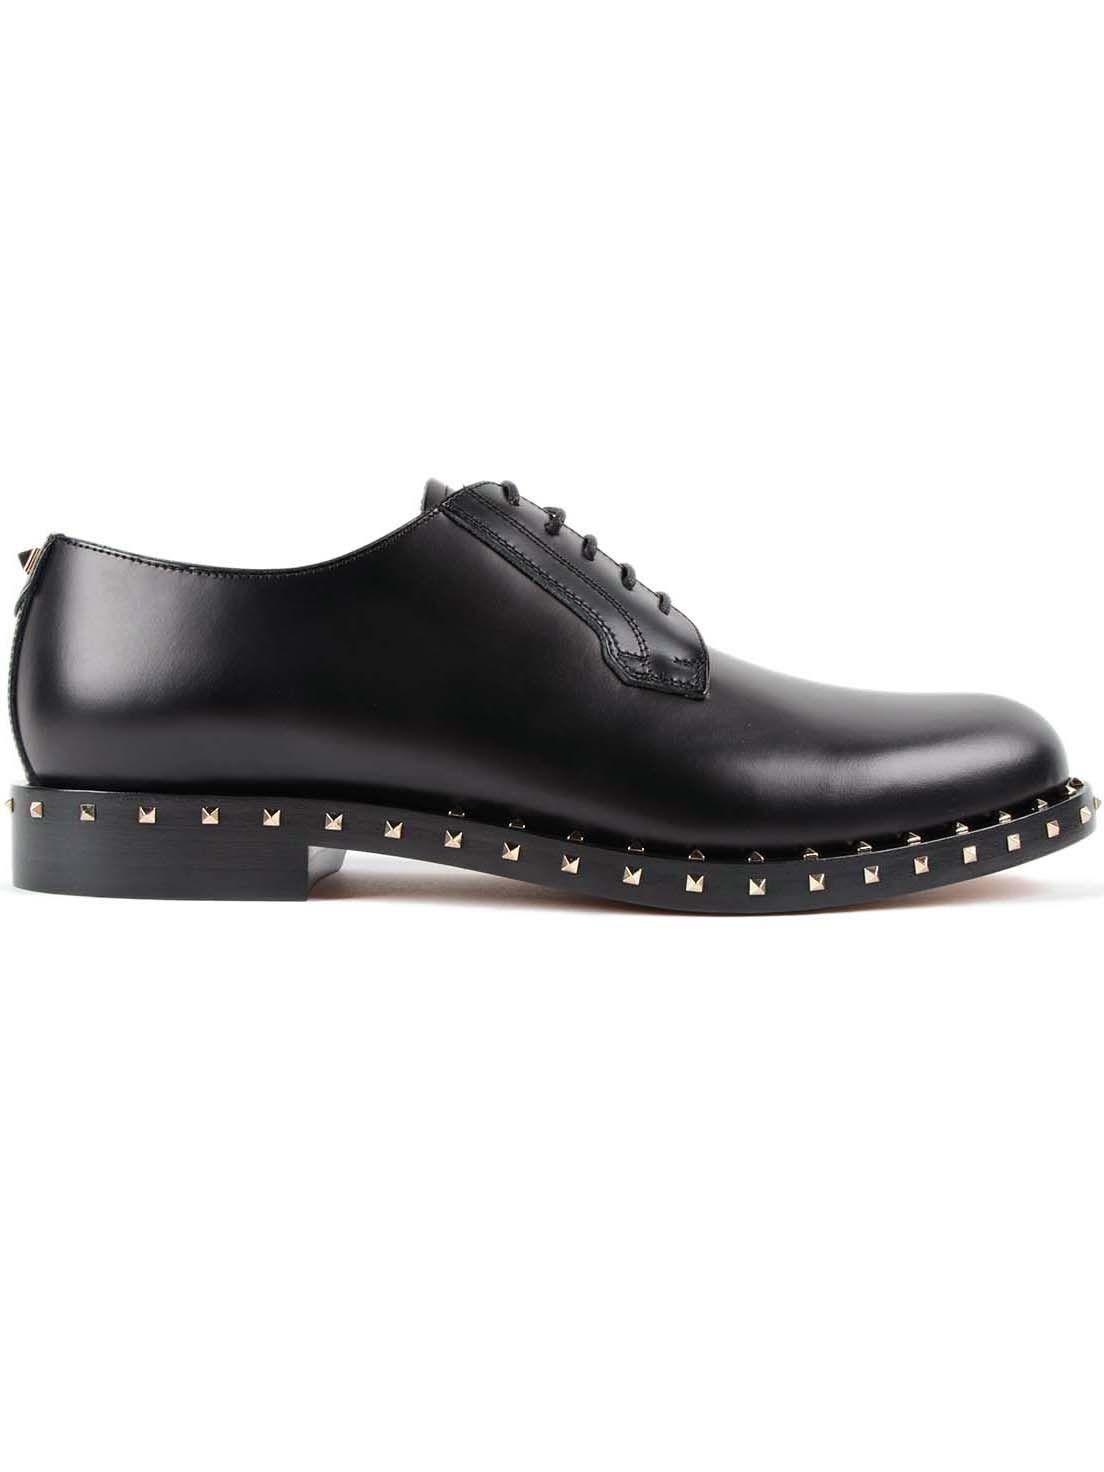 valentino garavani valentino garavani micro rockstud derby shoes black men 39 s laced shoes. Black Bedroom Furniture Sets. Home Design Ideas